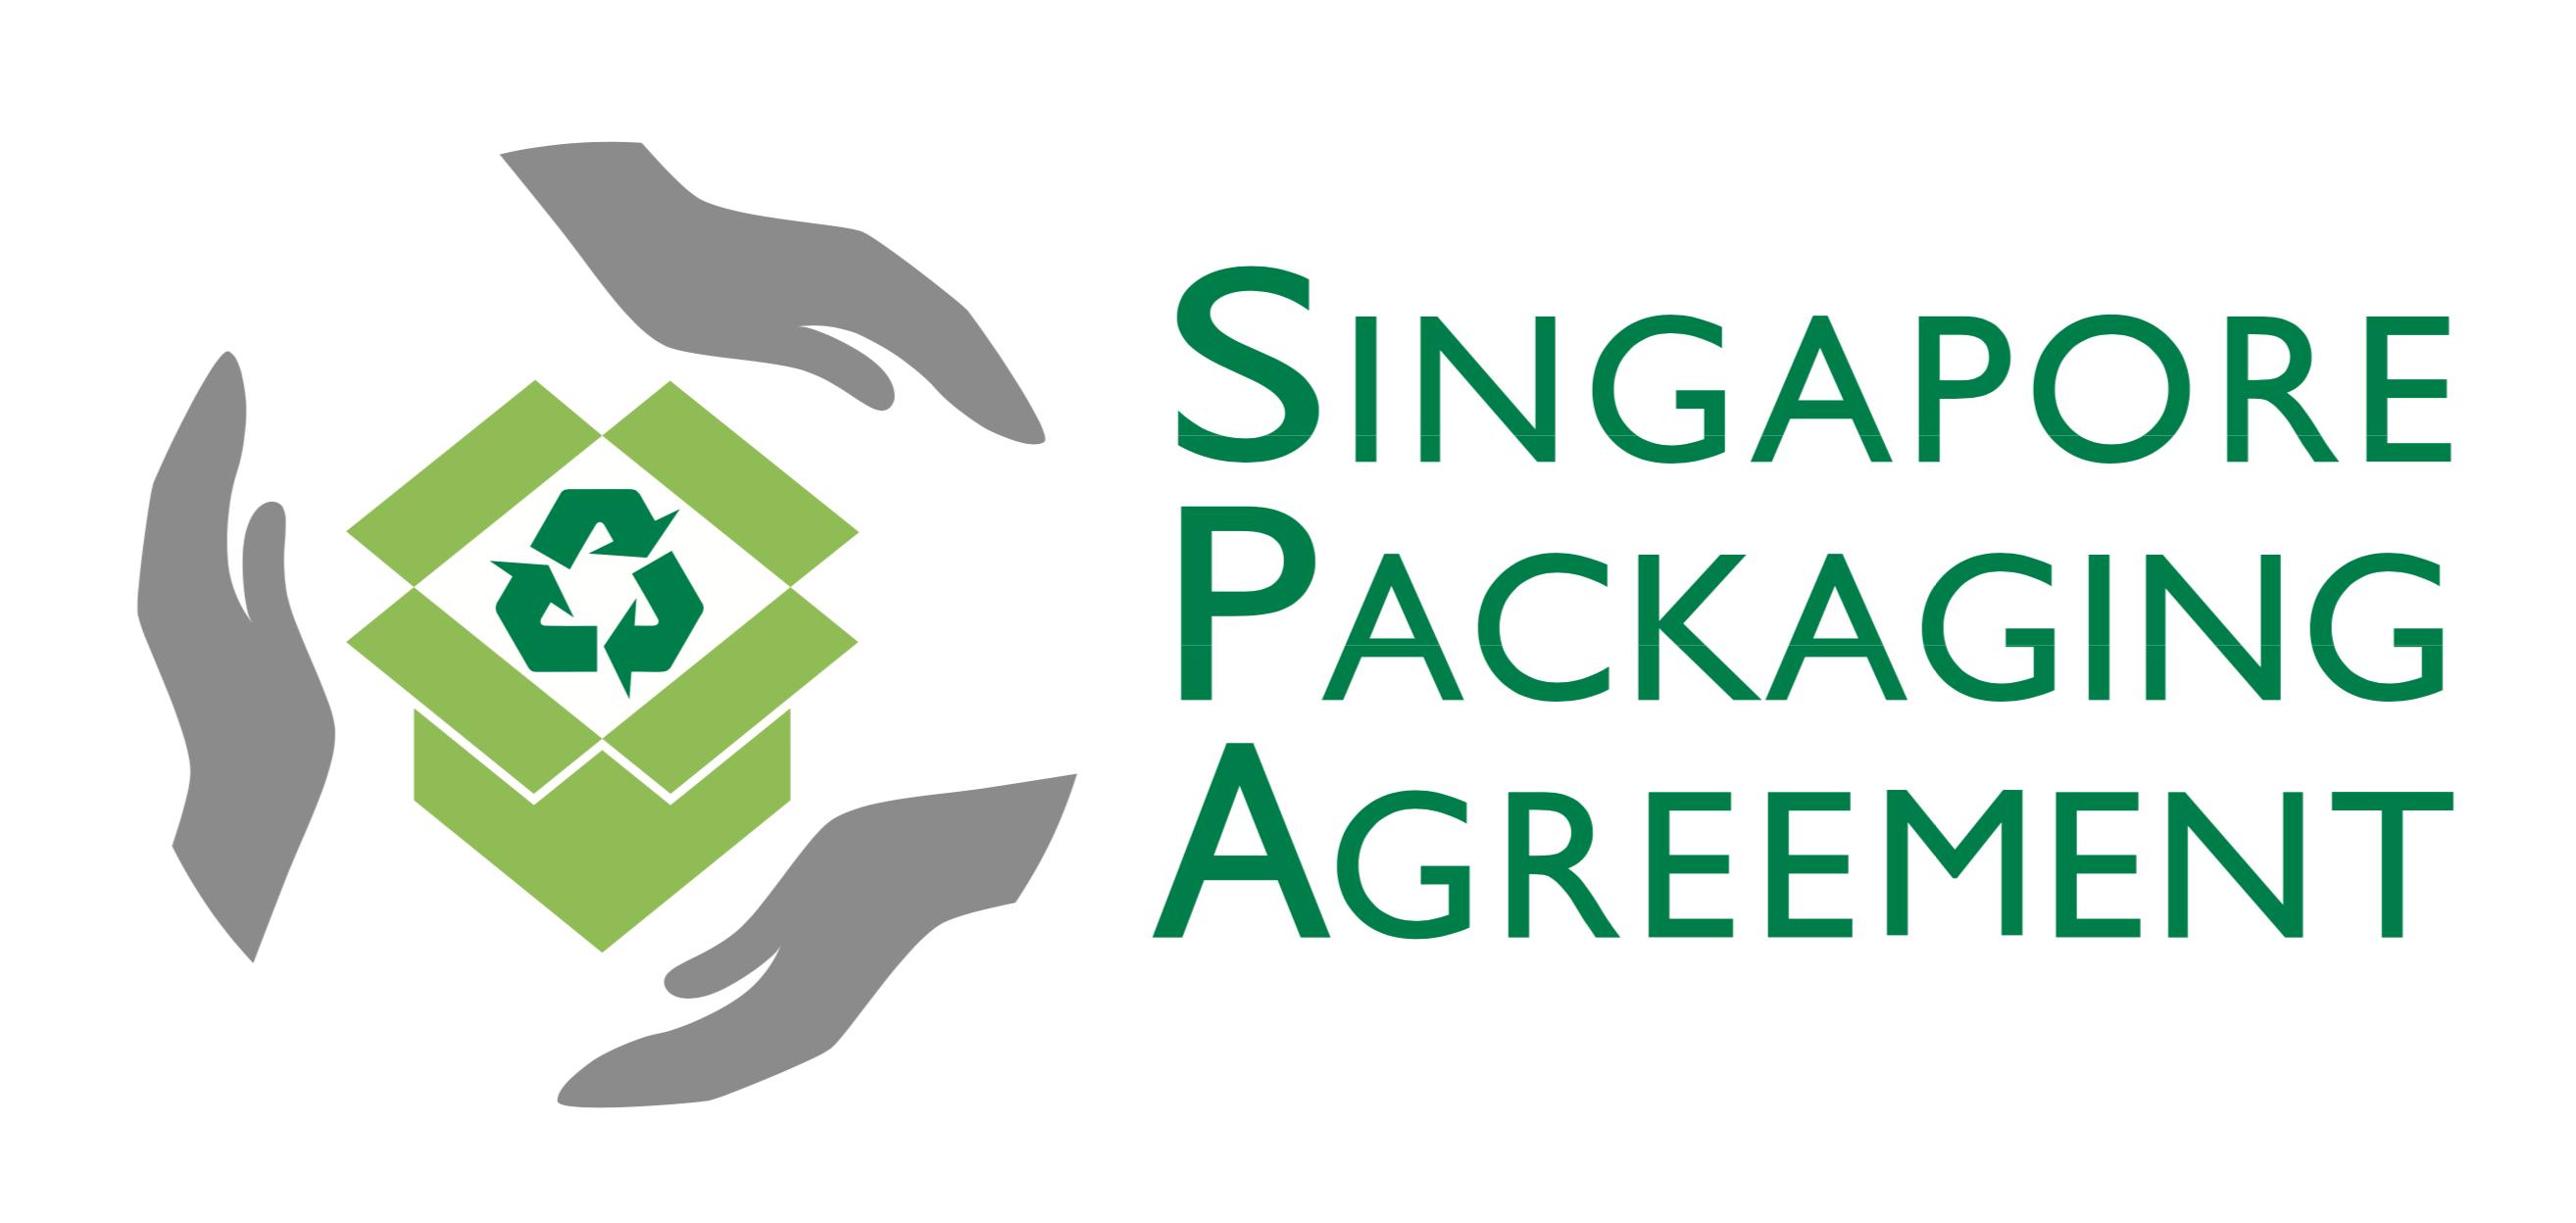 Singapore Packaging Agreement logo